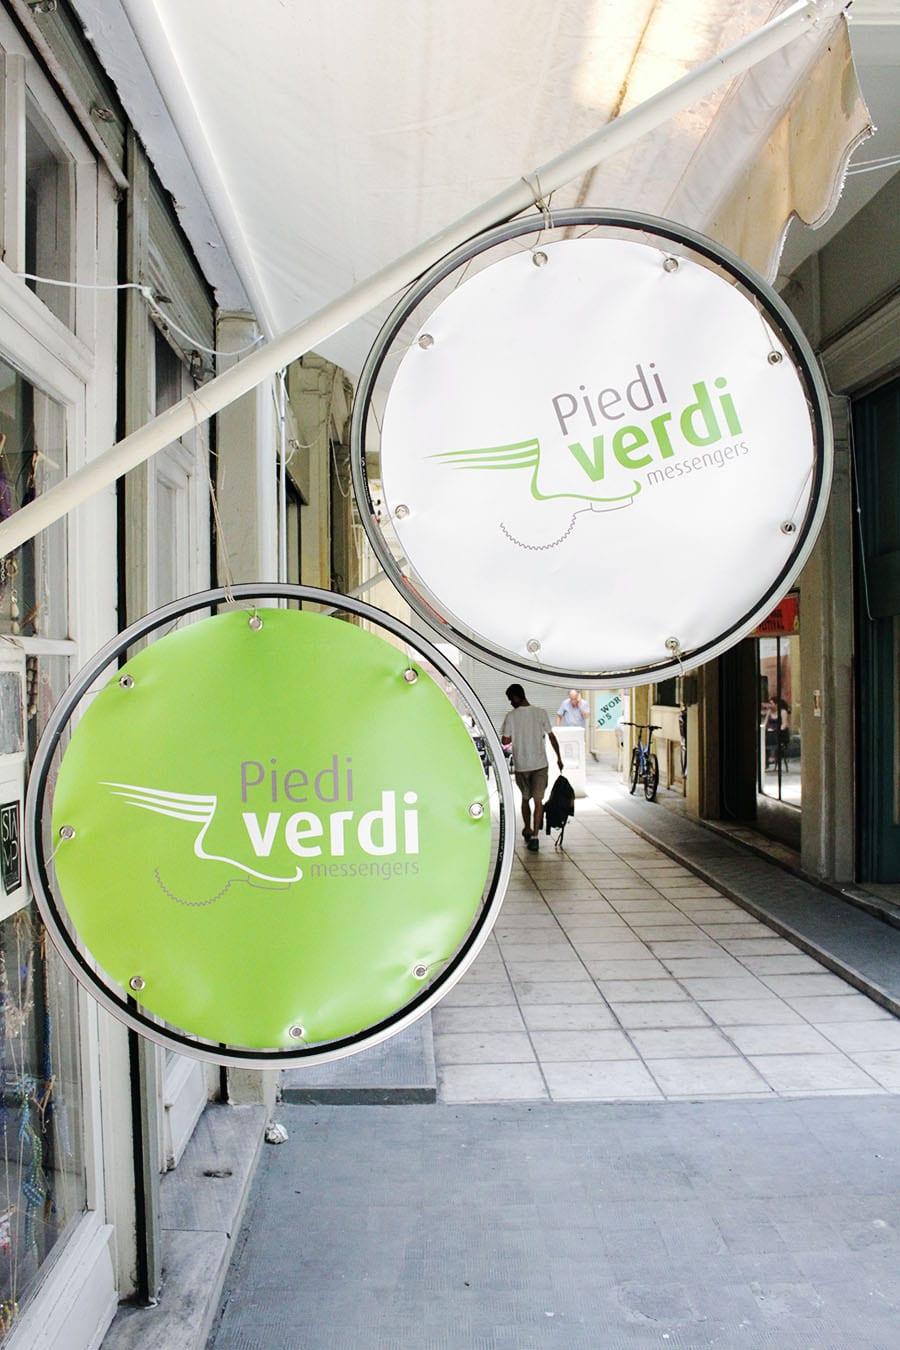 Piedi Verdi: Παιδιά για τα θελήματα ή μήπως καινοτόμα μυαλά;